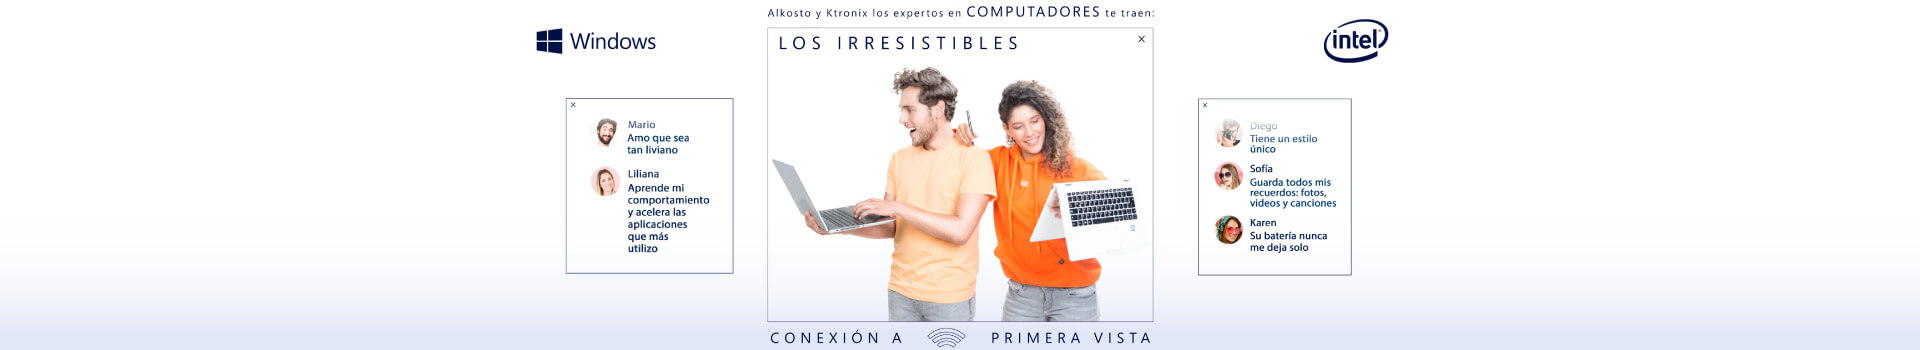 Computadores Irresistibles